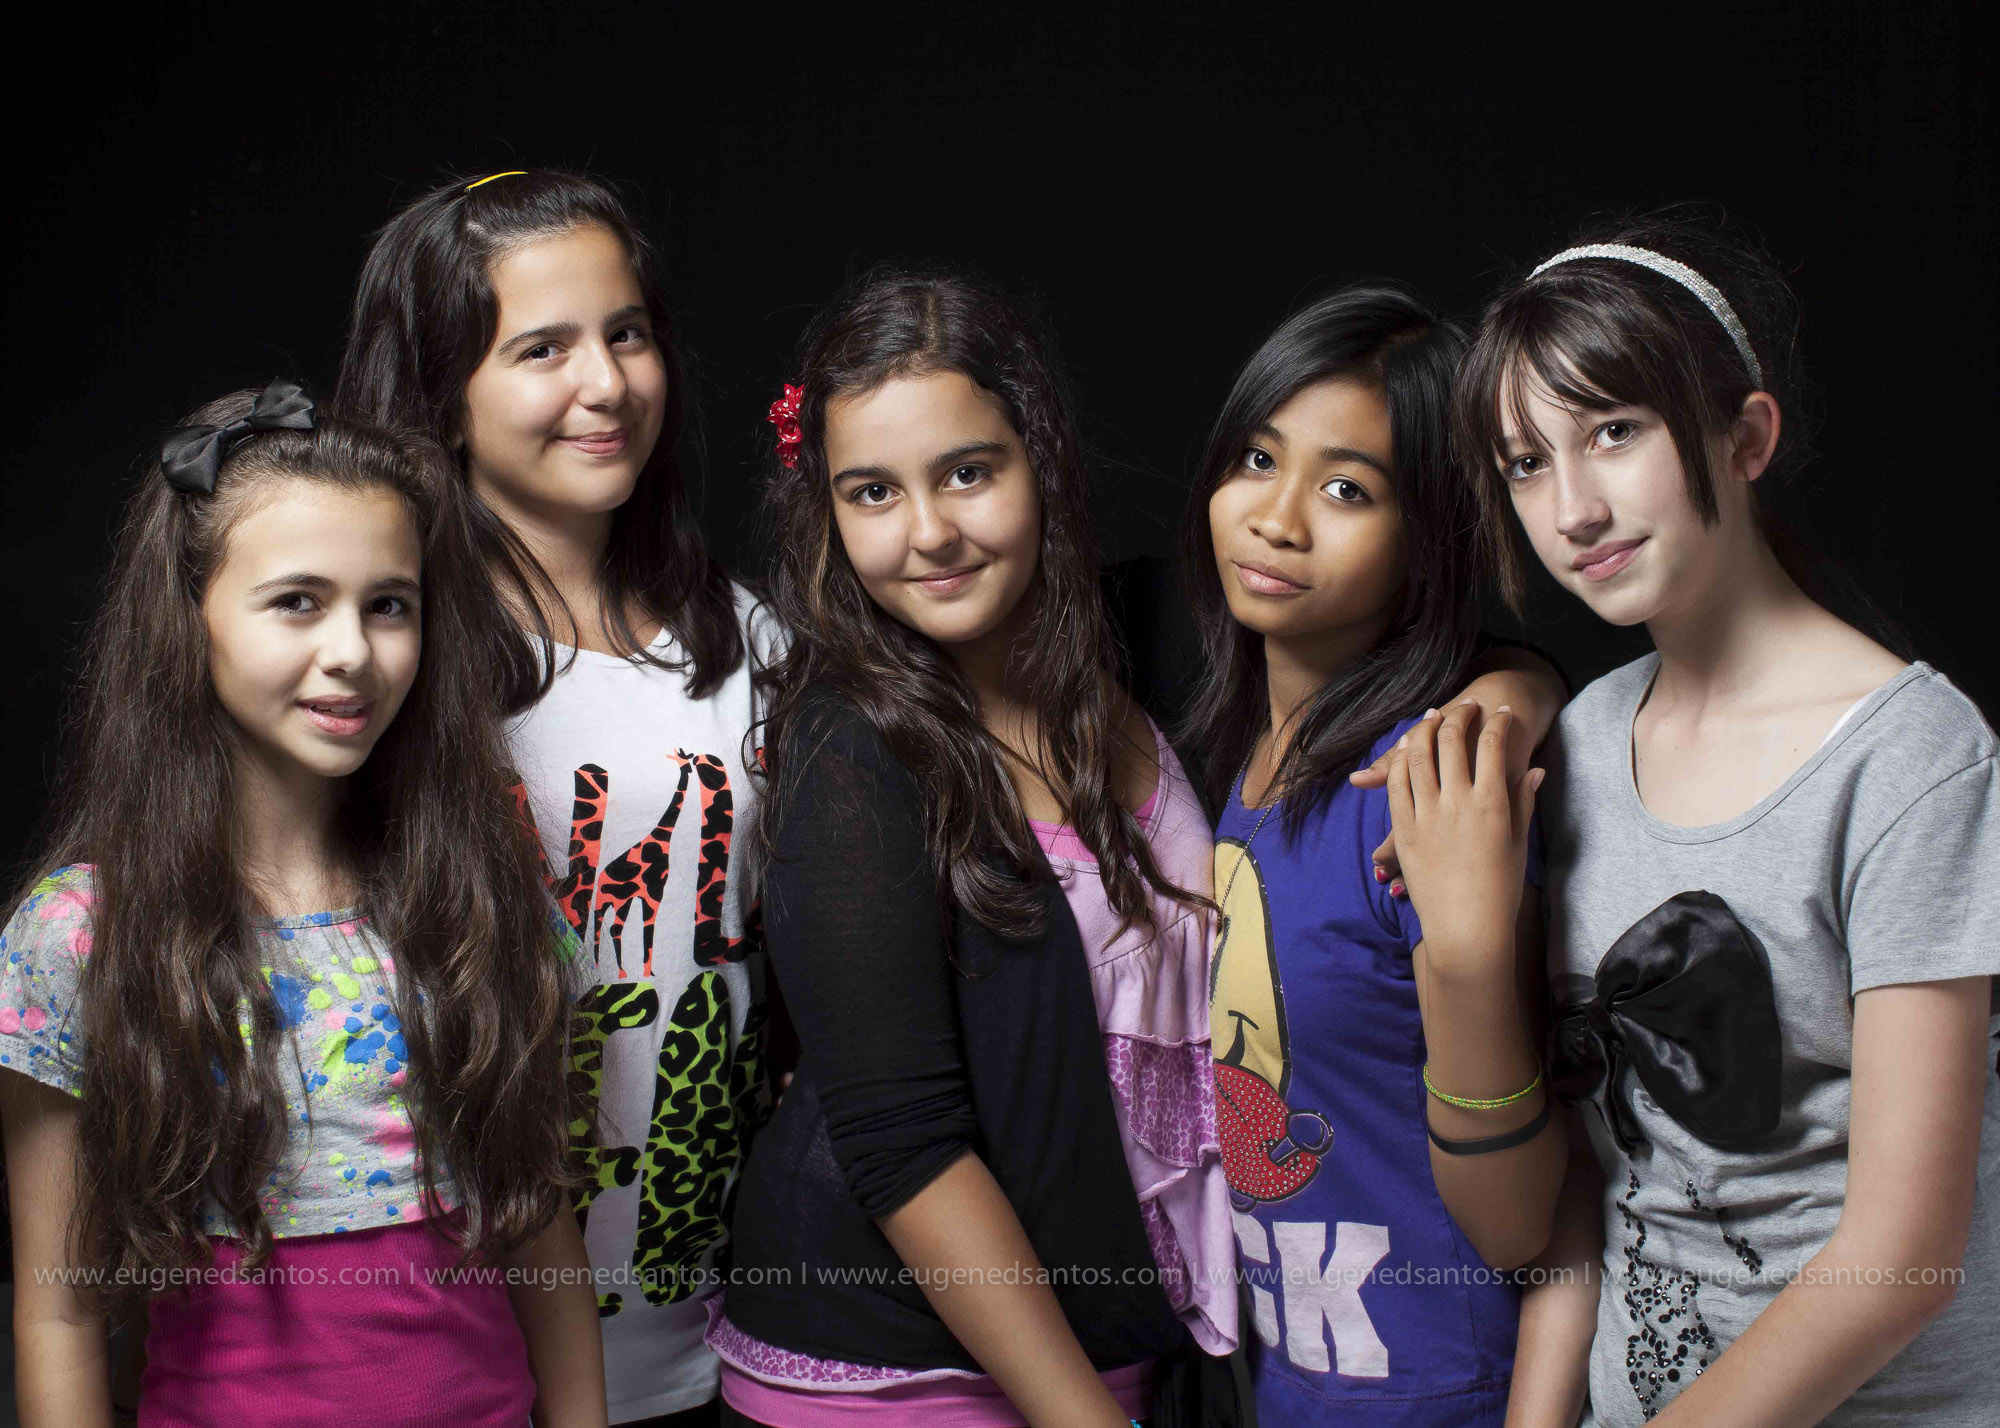 Group Teens Portrait